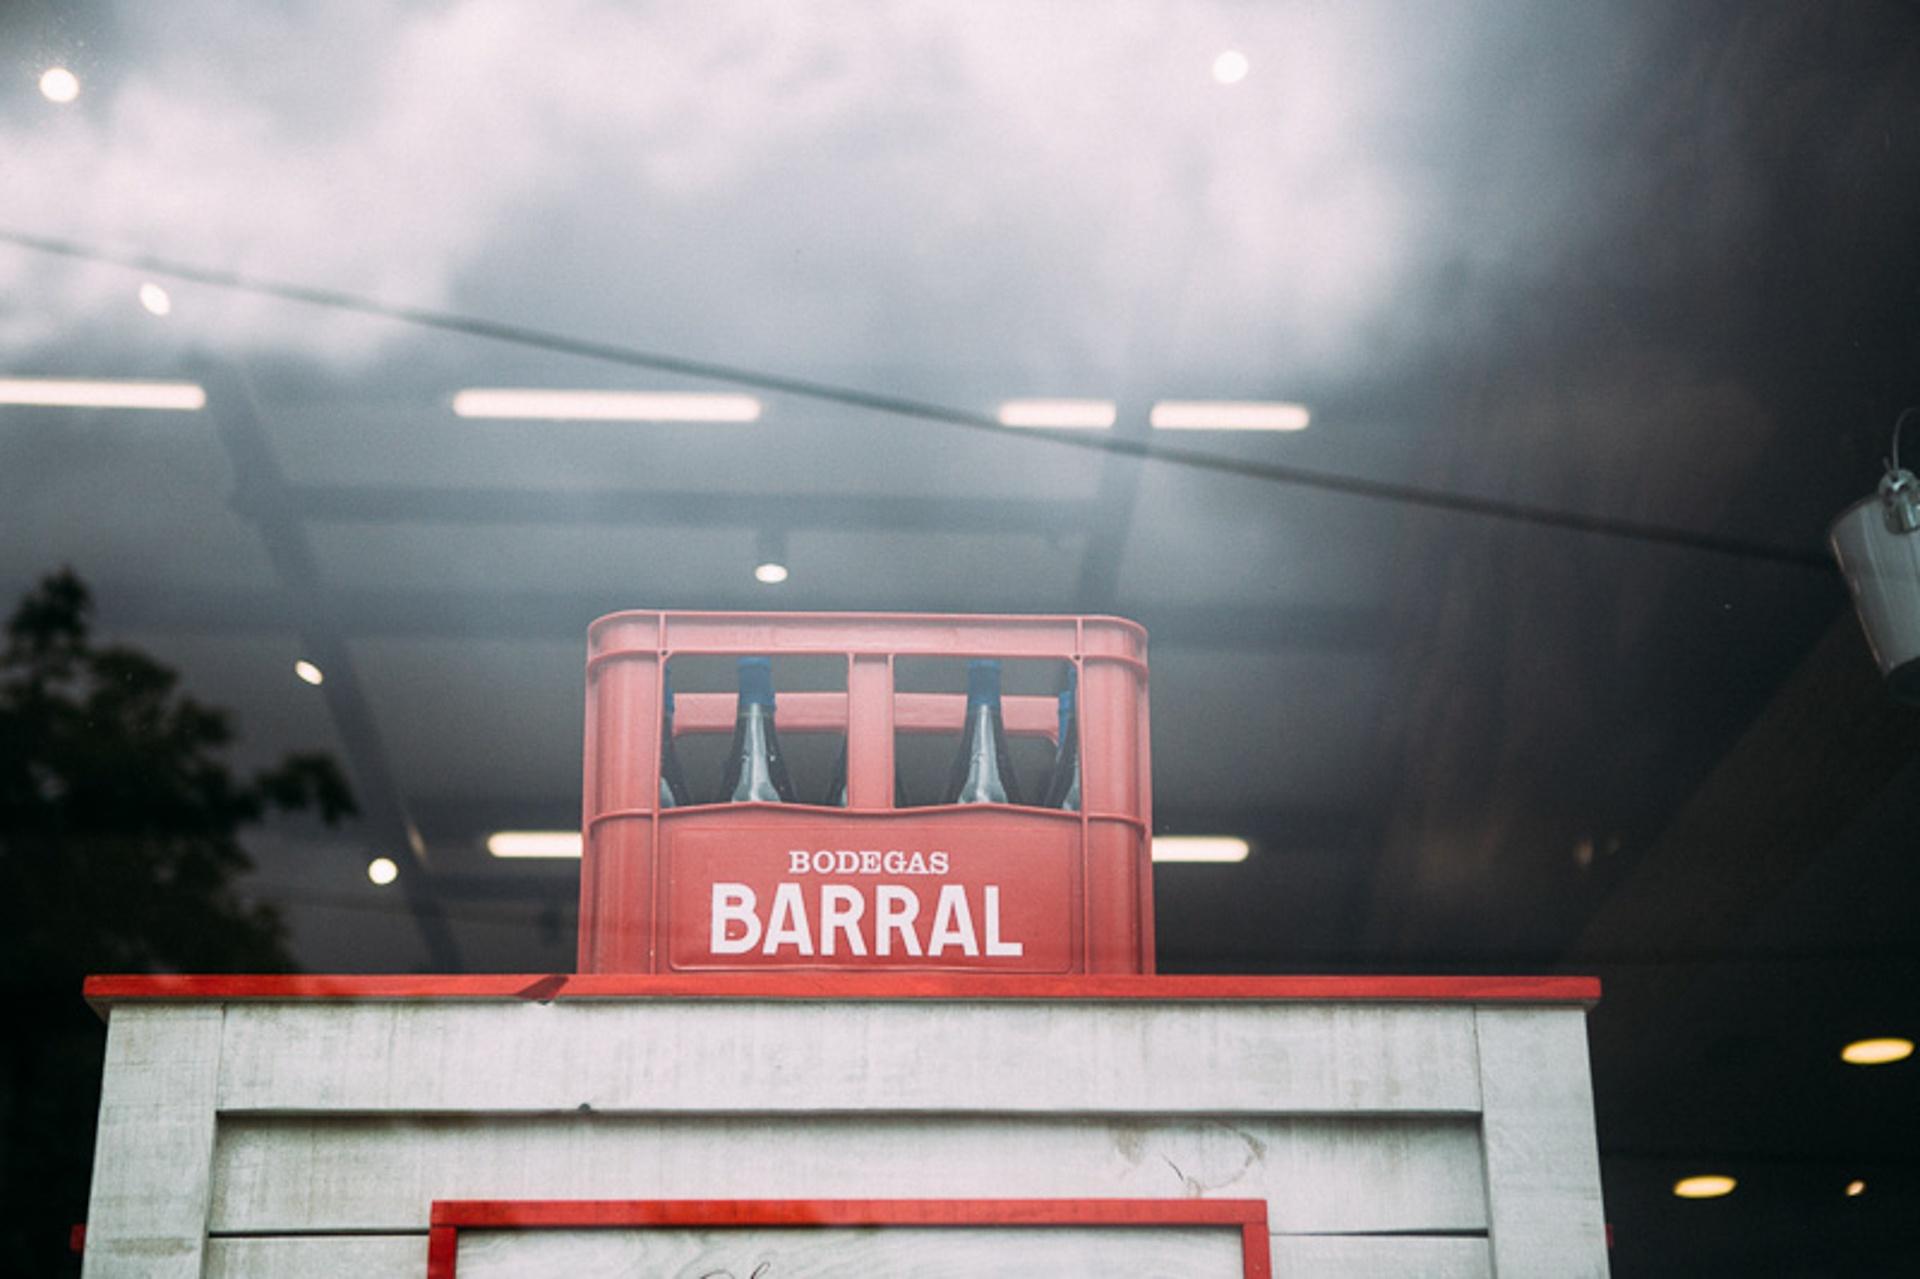 Bodegas Barral